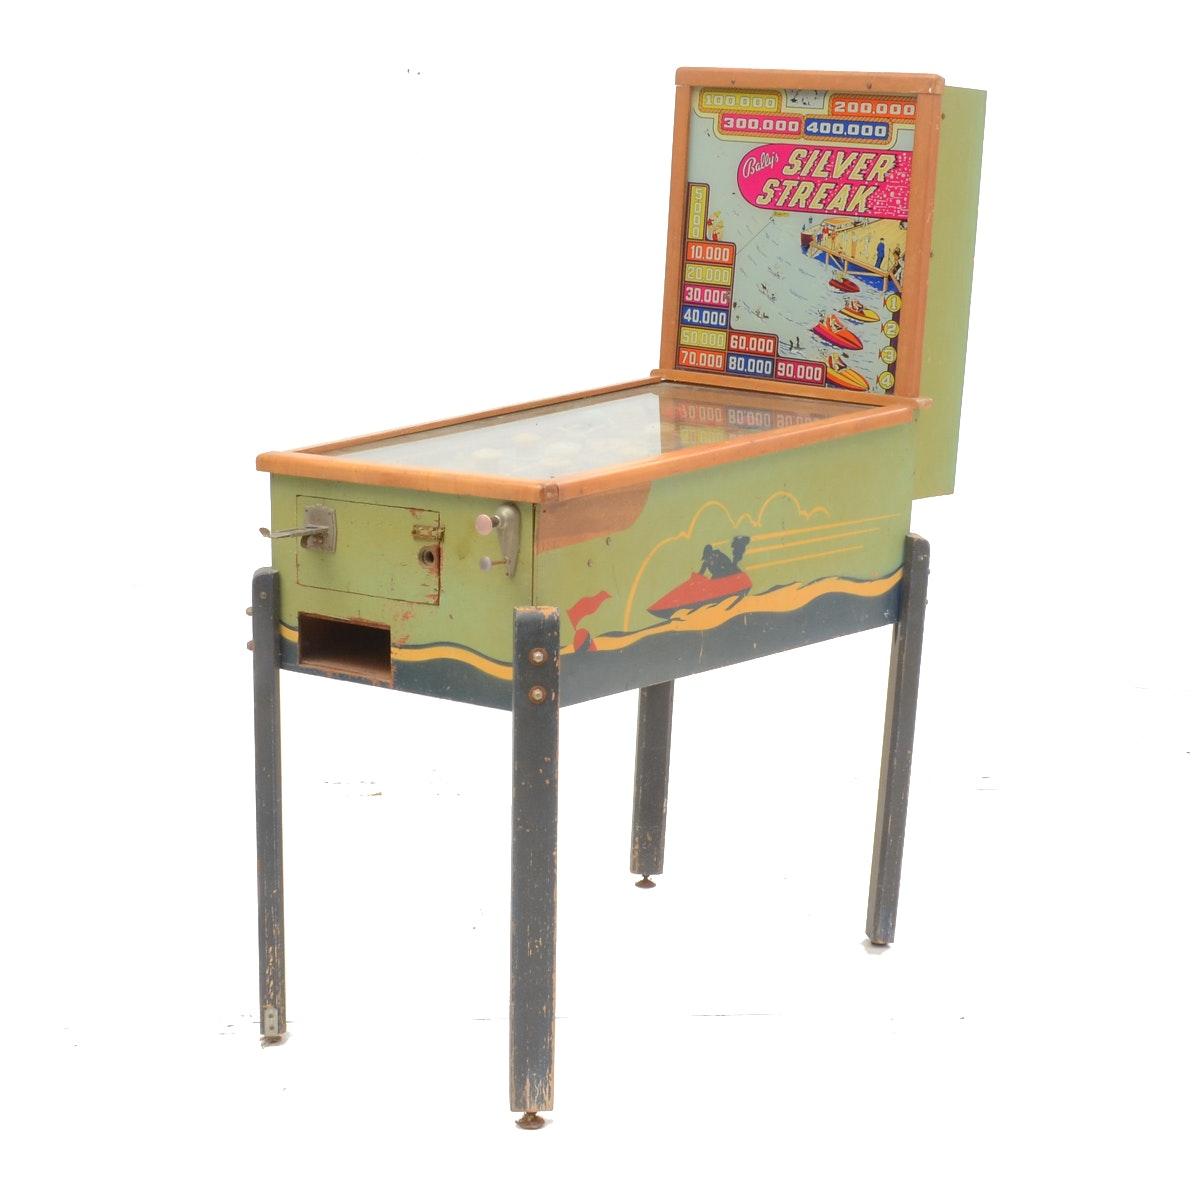 "1947 Bally ""Silver Streak"" Pinball Machine"